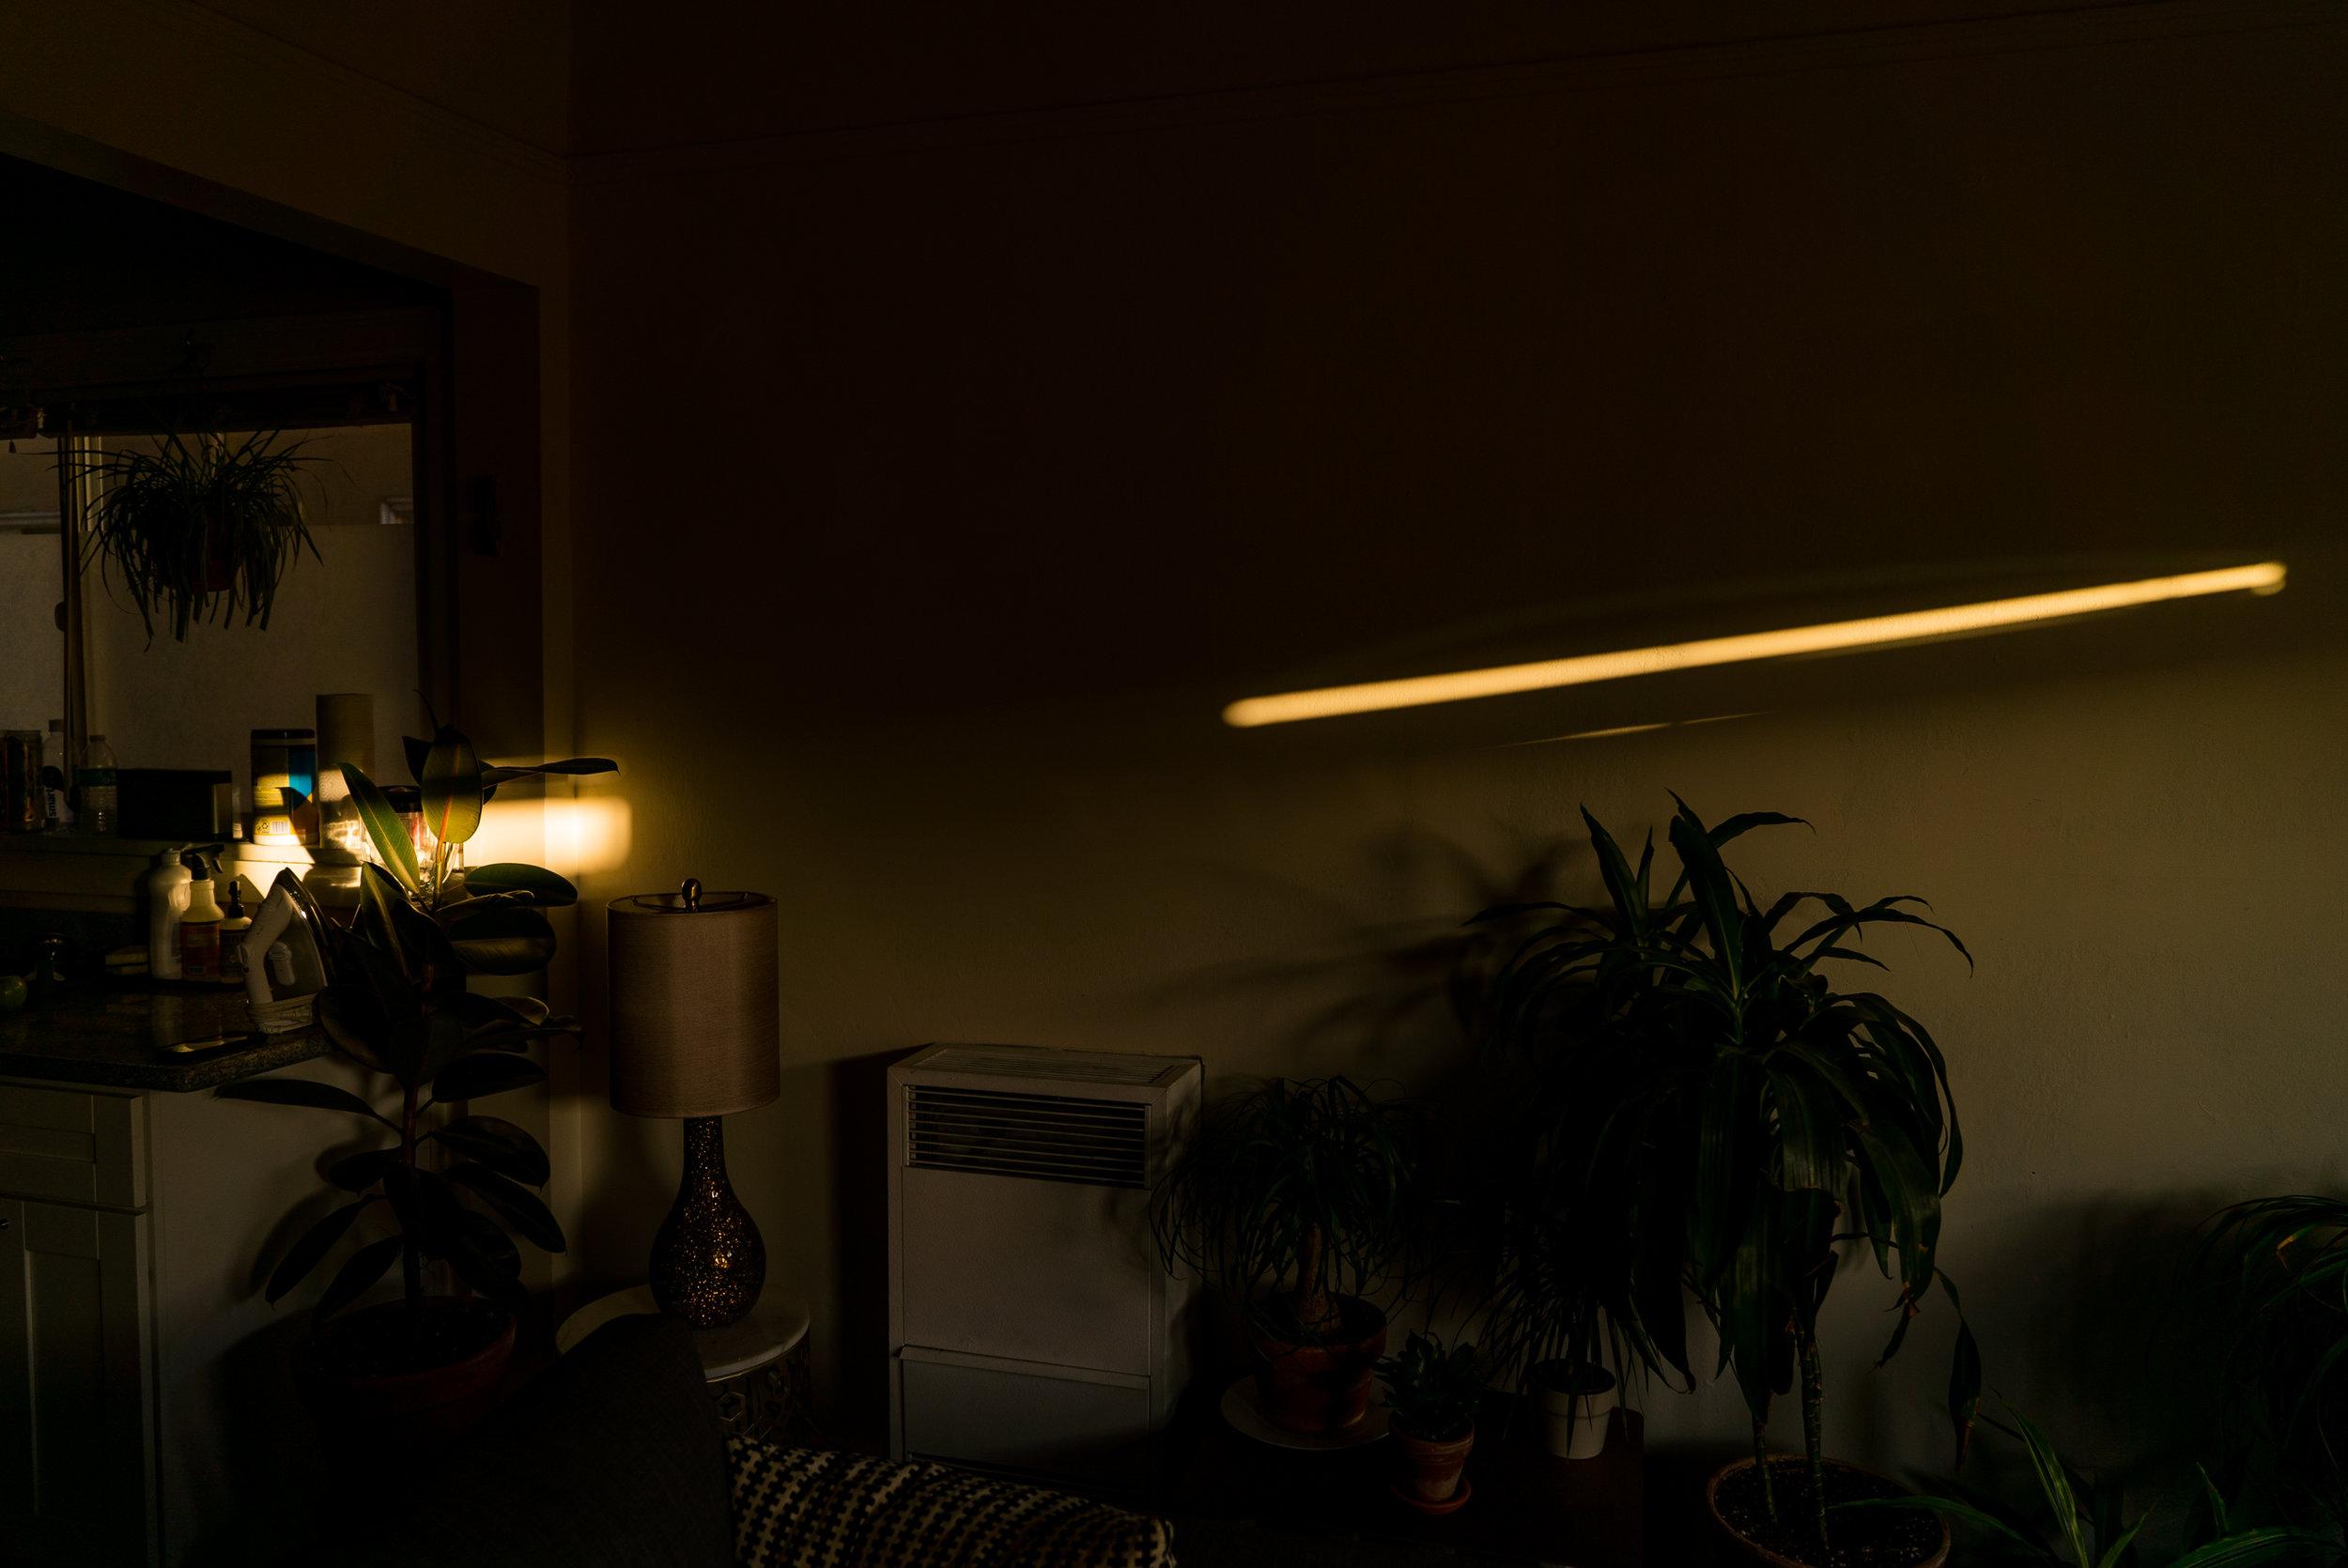 20180322-shadow_and_light-001.jpg